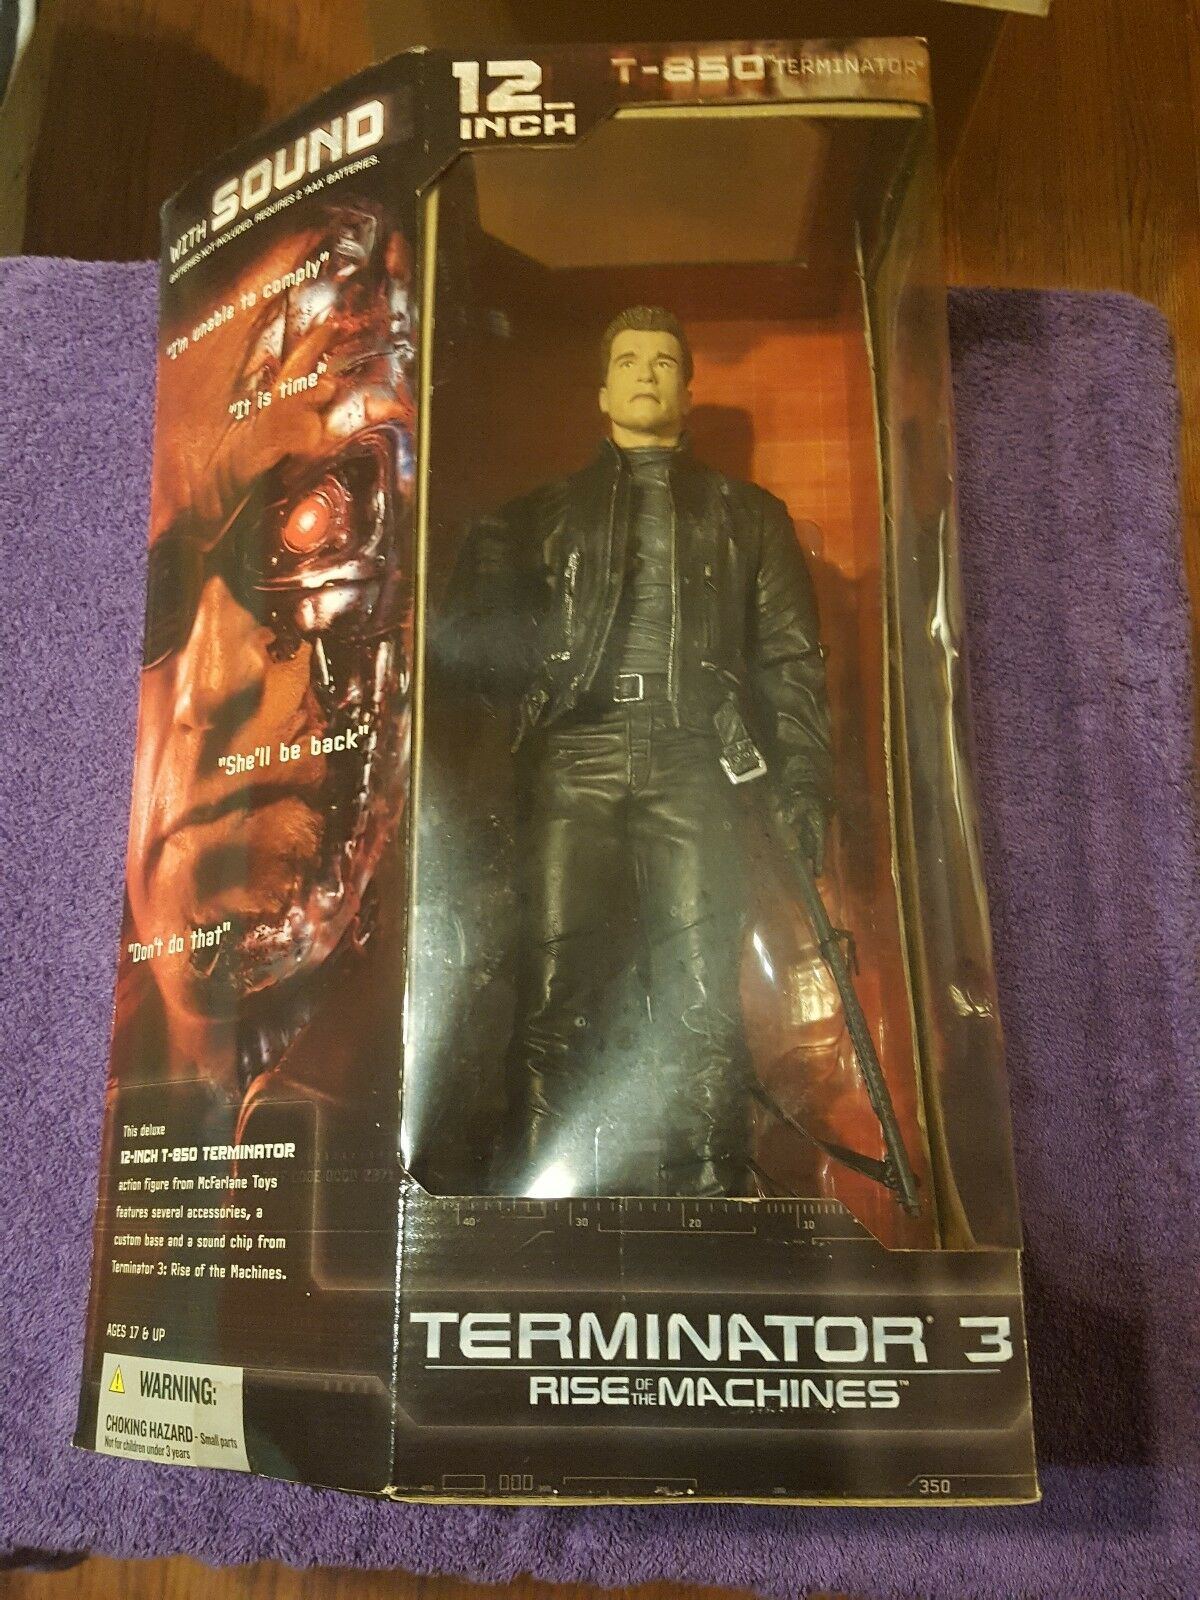 2003 McFarlane Toys 12  T-850 Terminator With Sound